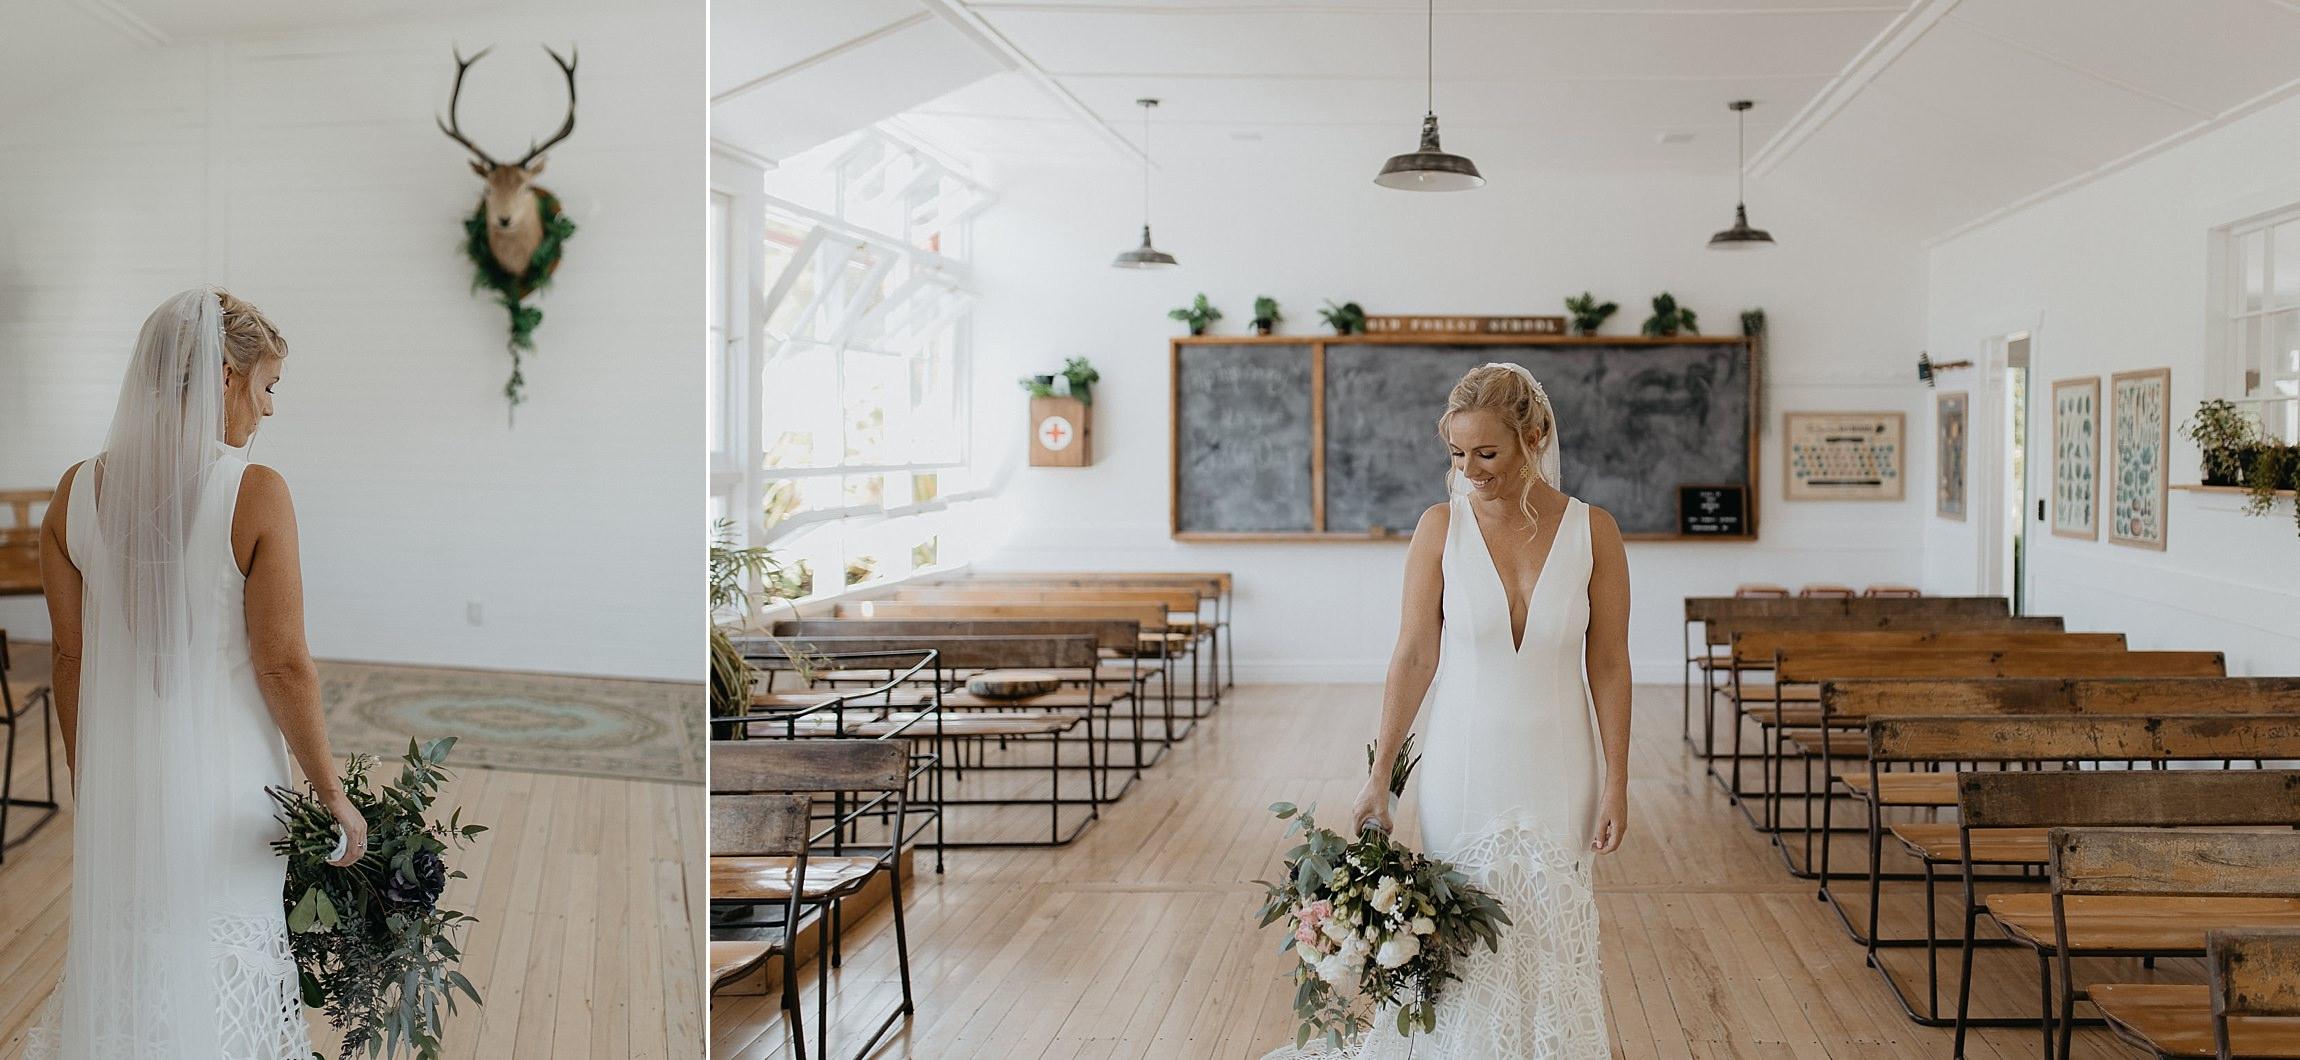 oldforestschool-wedding-blog-68.jpg